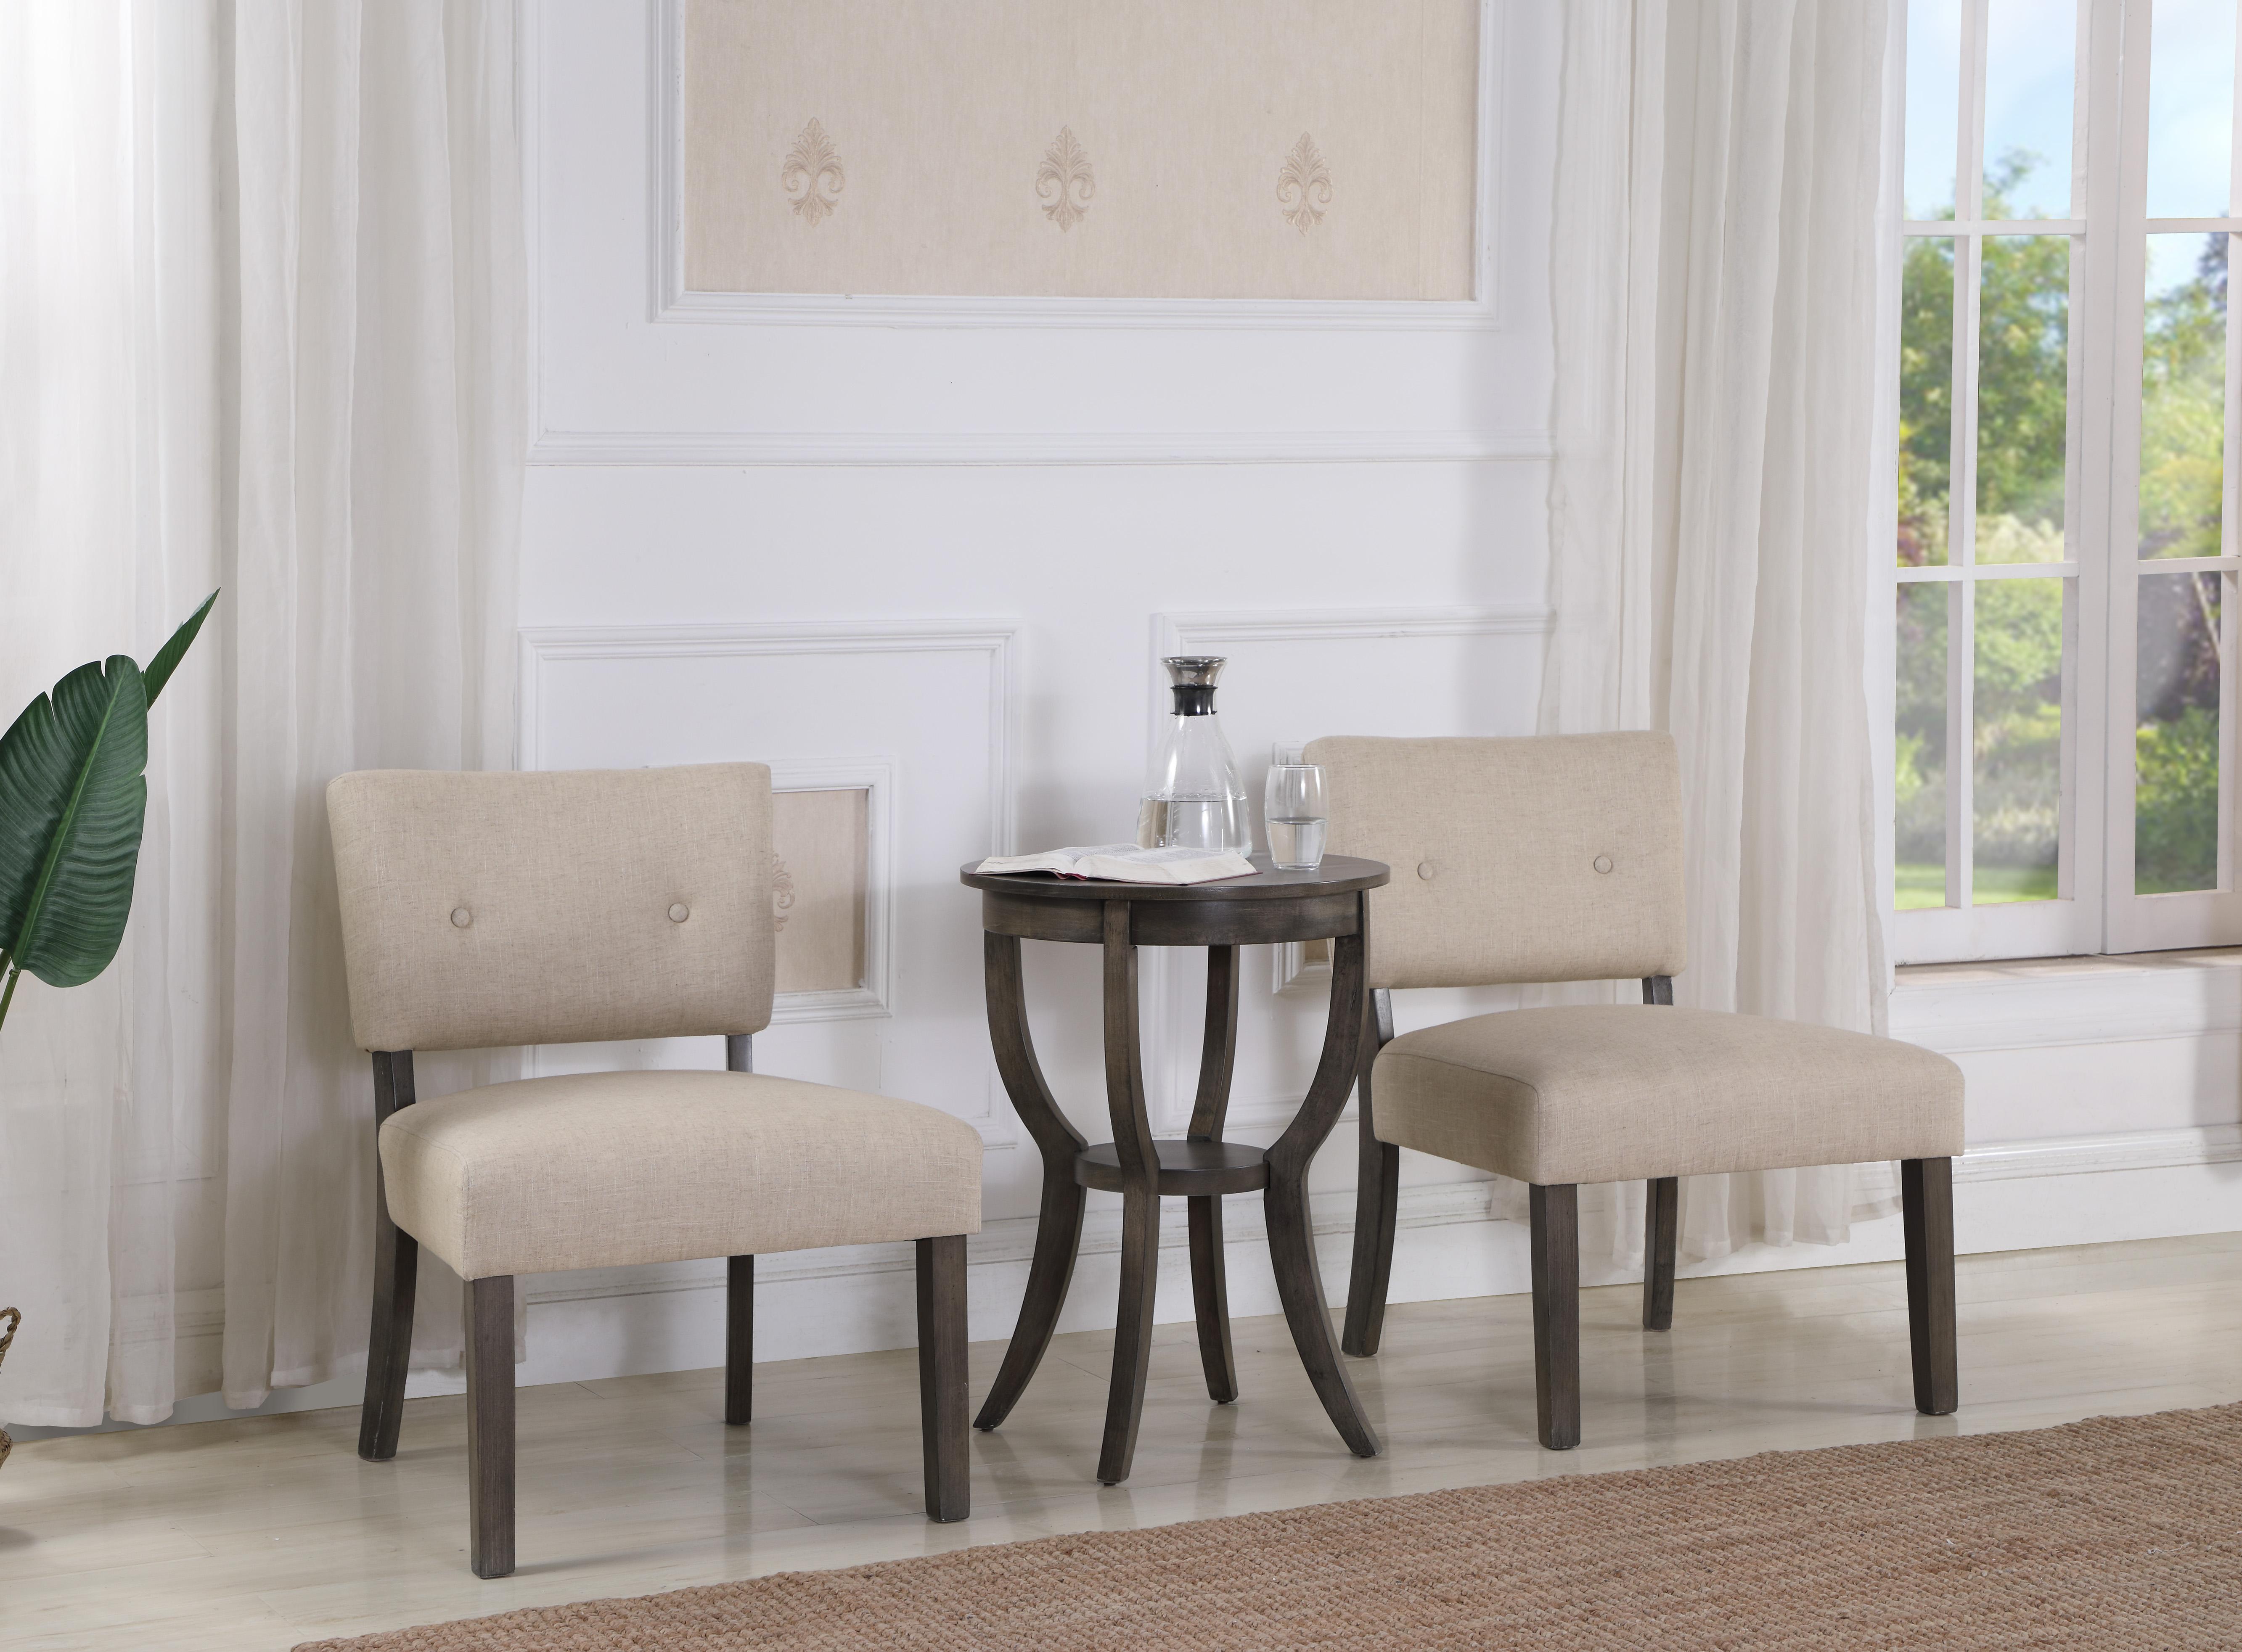 Best Master Furniture Johannesburg 3-Piece Living Room Accent Arm